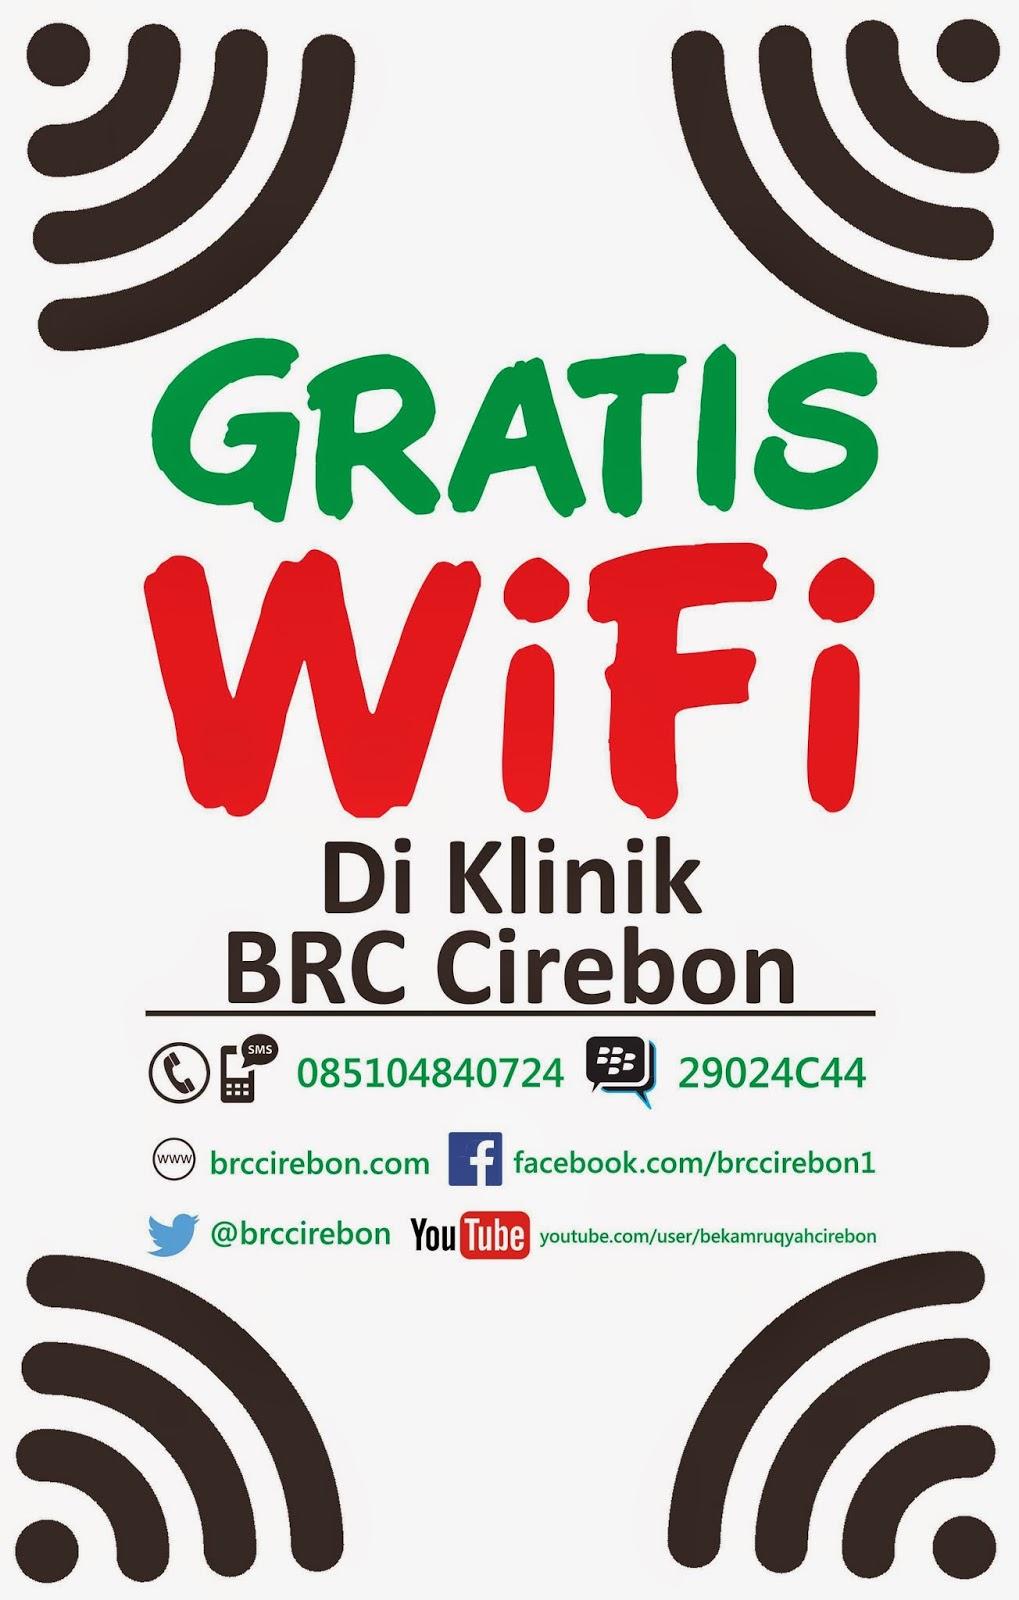 Klinik Bekam Ruqyah Center Cabang Cirebon Gratis Akses Internet WiFi Hotspot